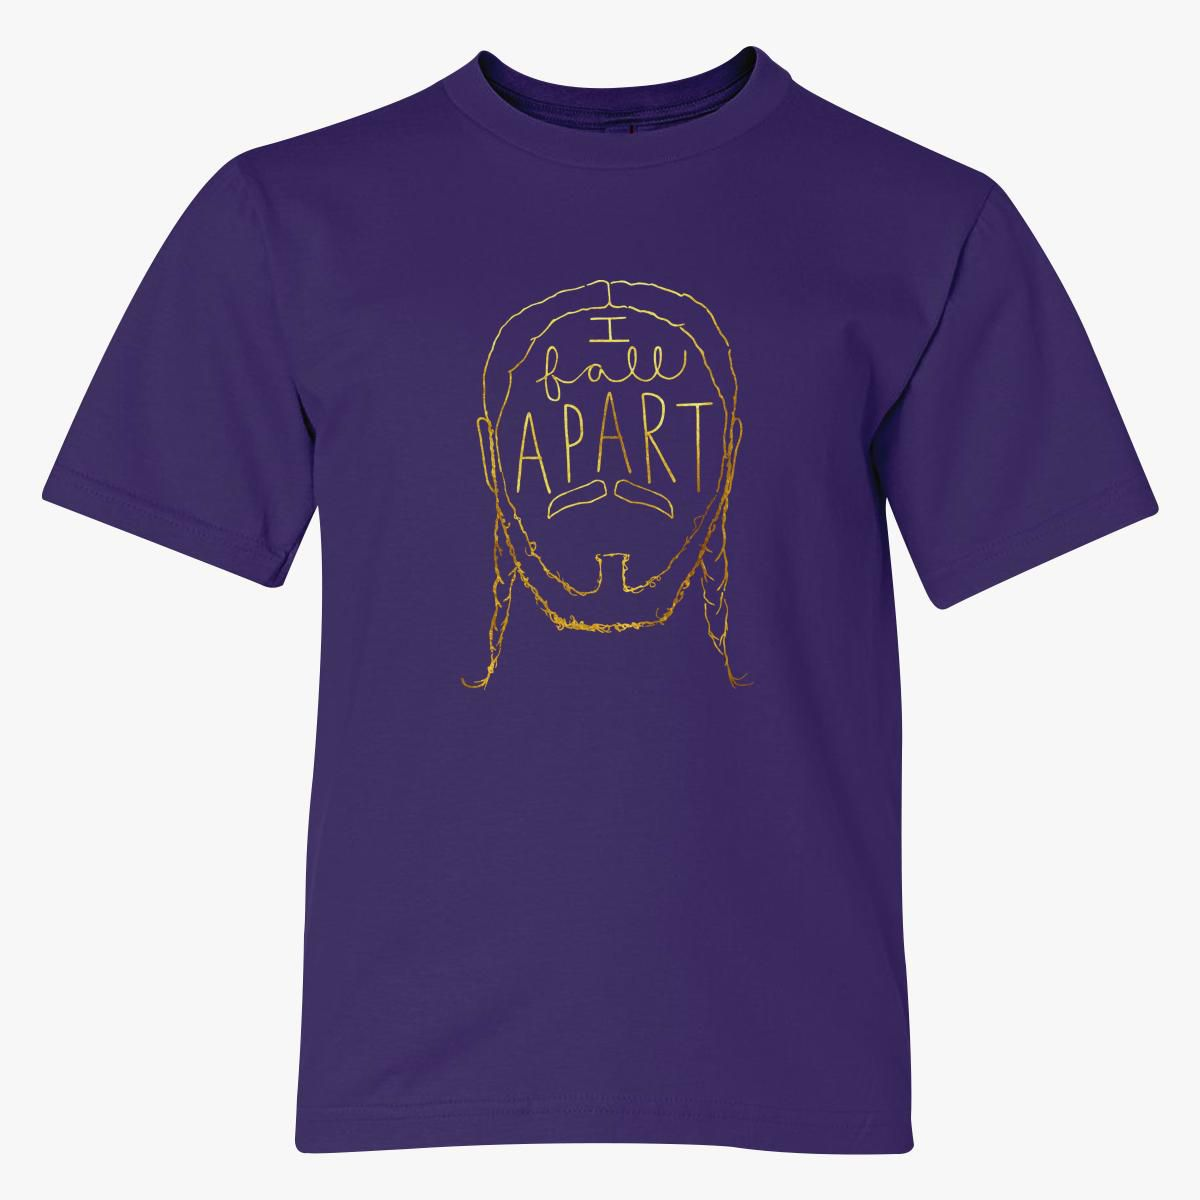 Post Malone I Fall Apart Youth T-shirt